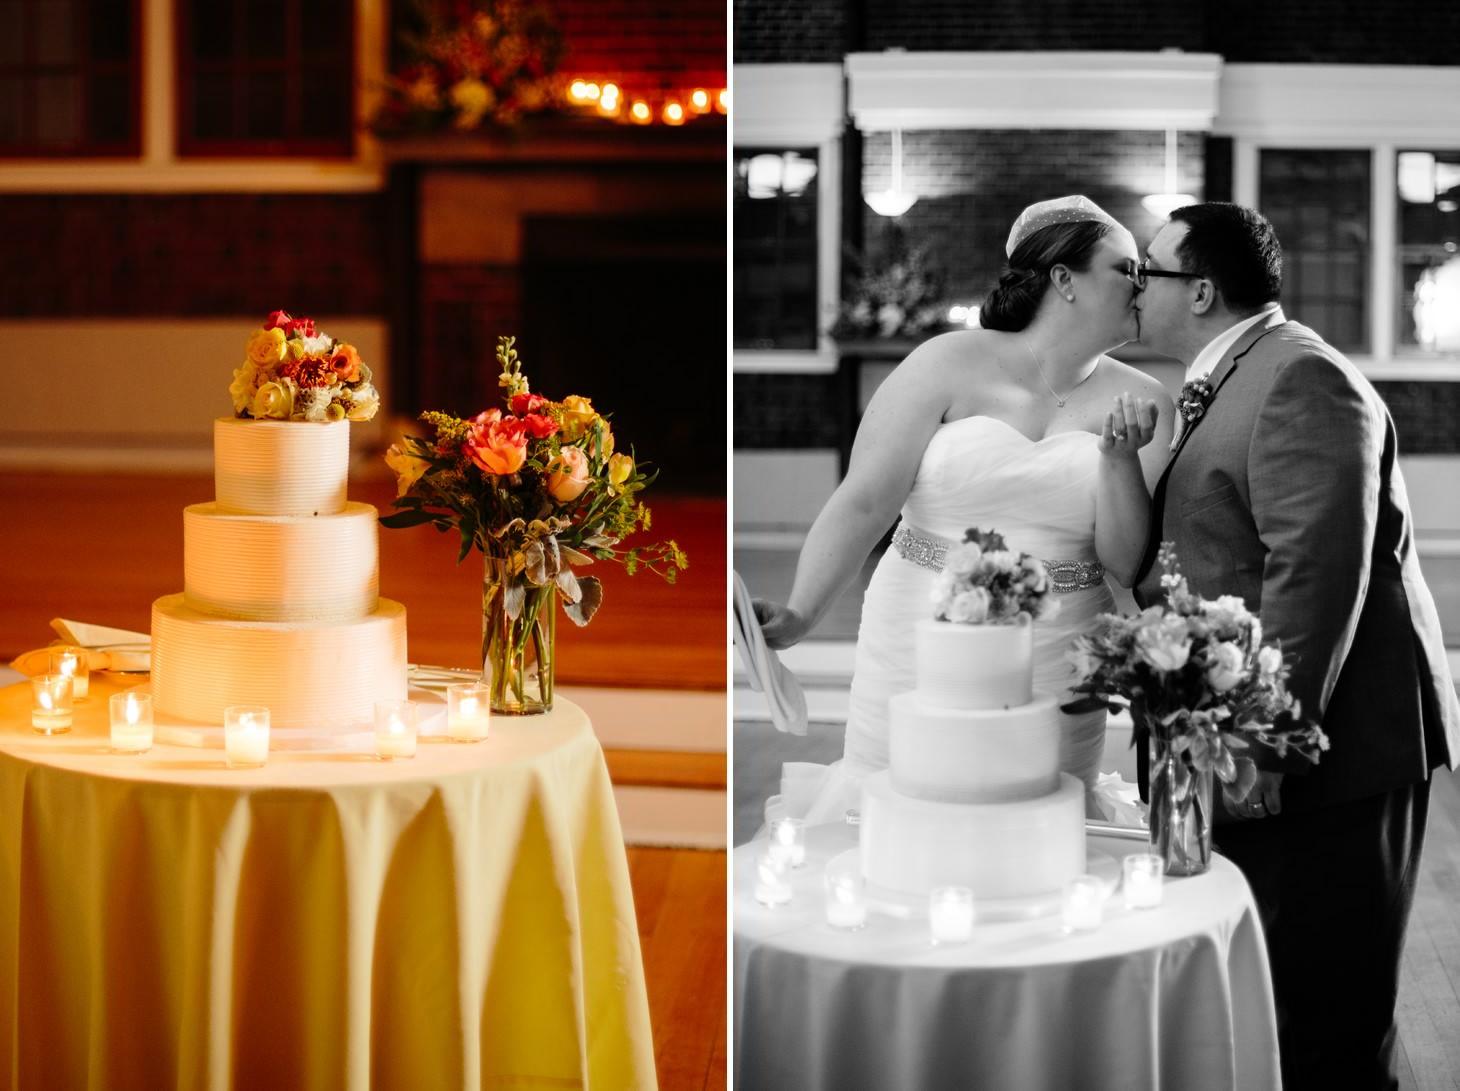 nyc-brooklyn-prospect-park-picnic-house-wedding-smitten-chickens-nerdy-55.jpg